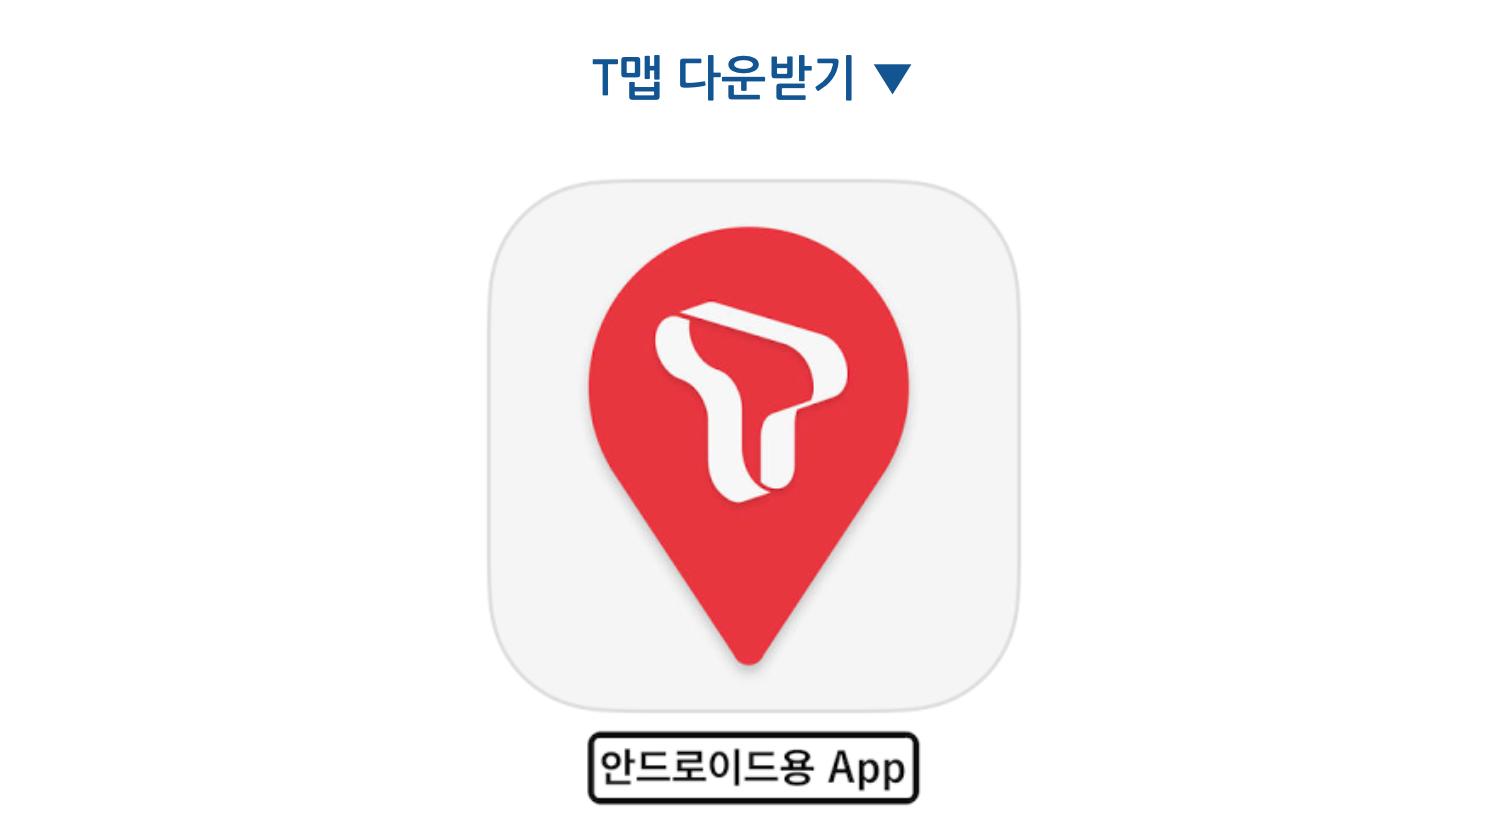 https://play.google.com/store/apps/details?id=com.skplanet.tmaplink